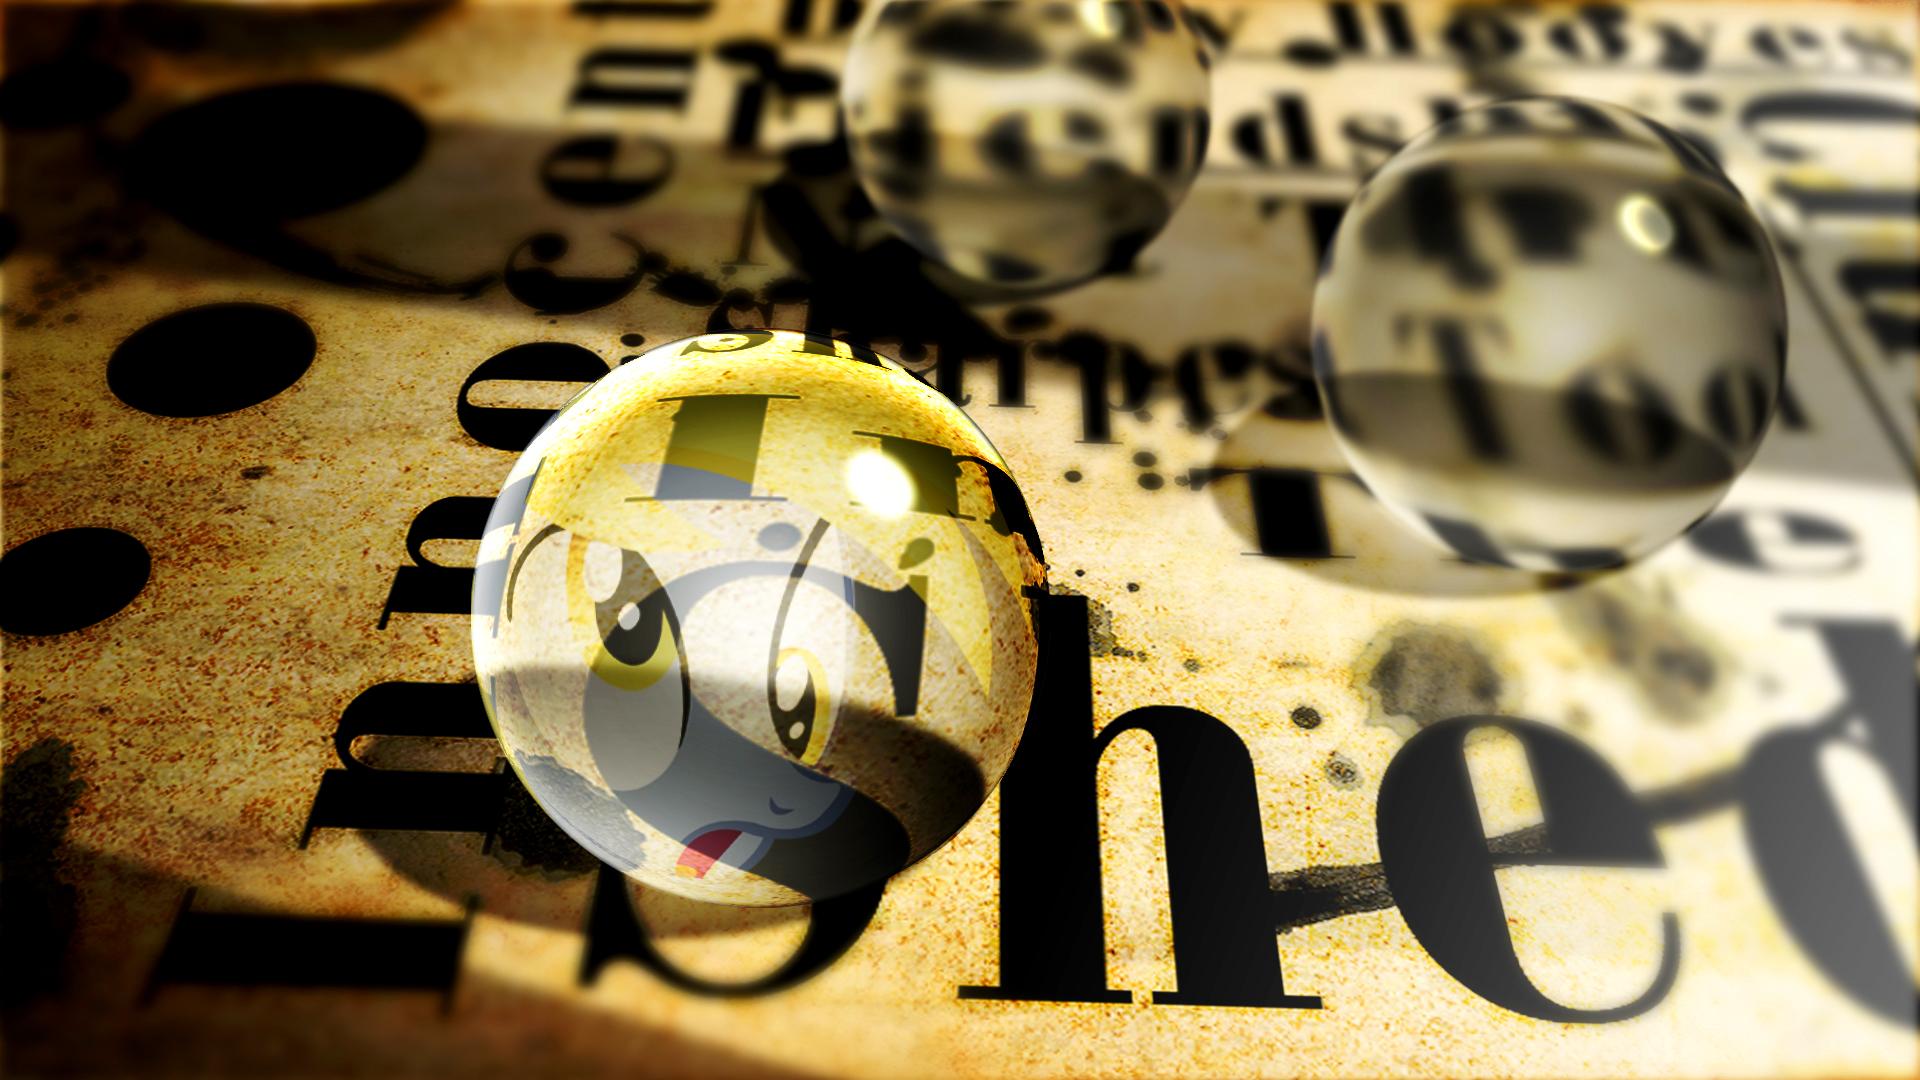 CB Derpy Hooves Wallpaper by InternationalTCK